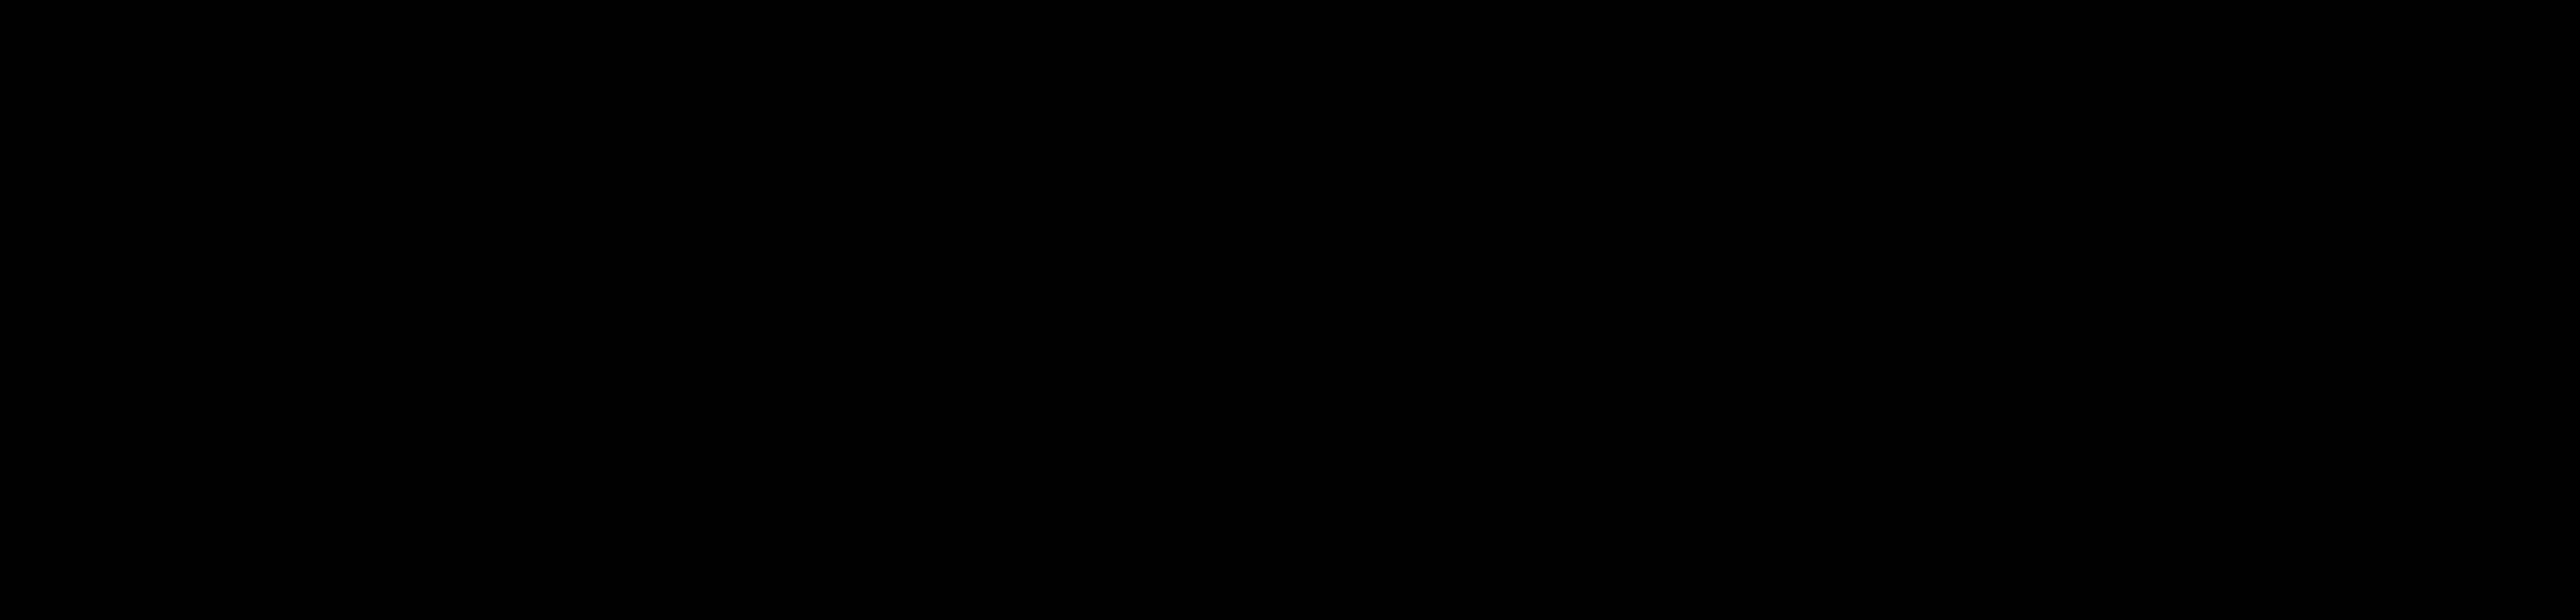 joop logo 1 - Joop! Logo